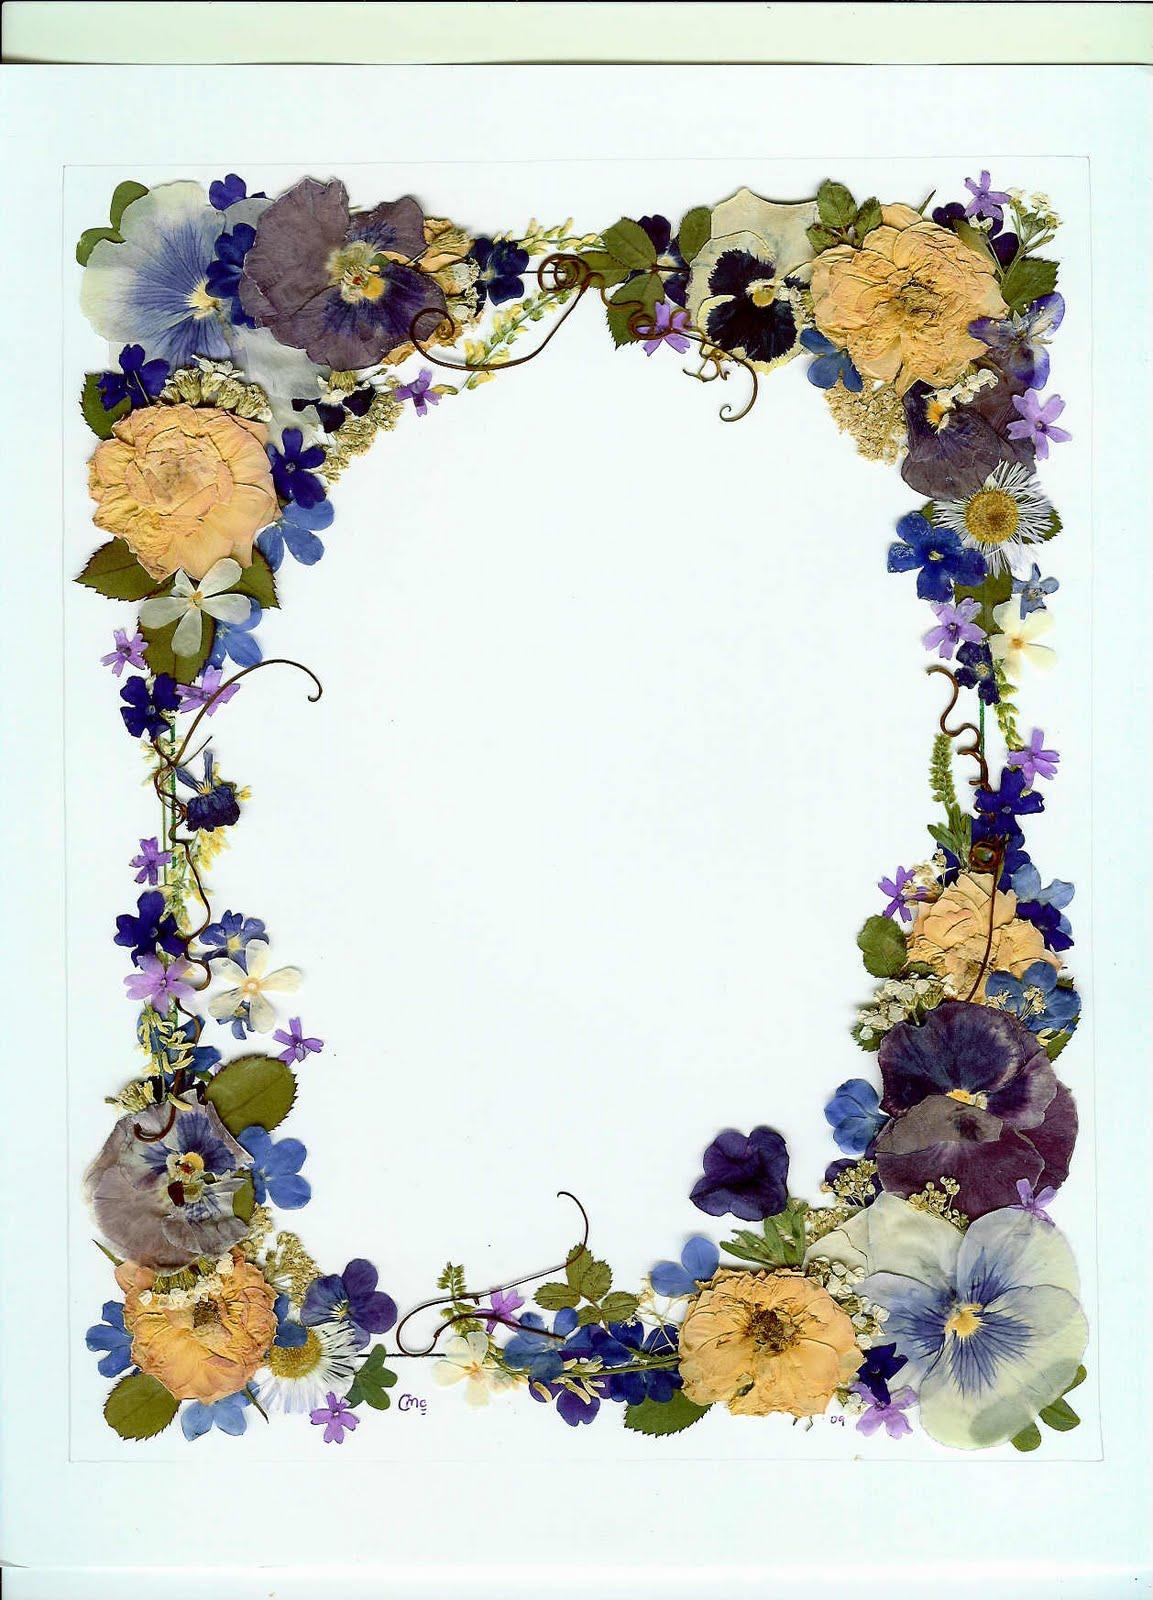 Charlene s Pressed Flower Original Pressed Flower Art